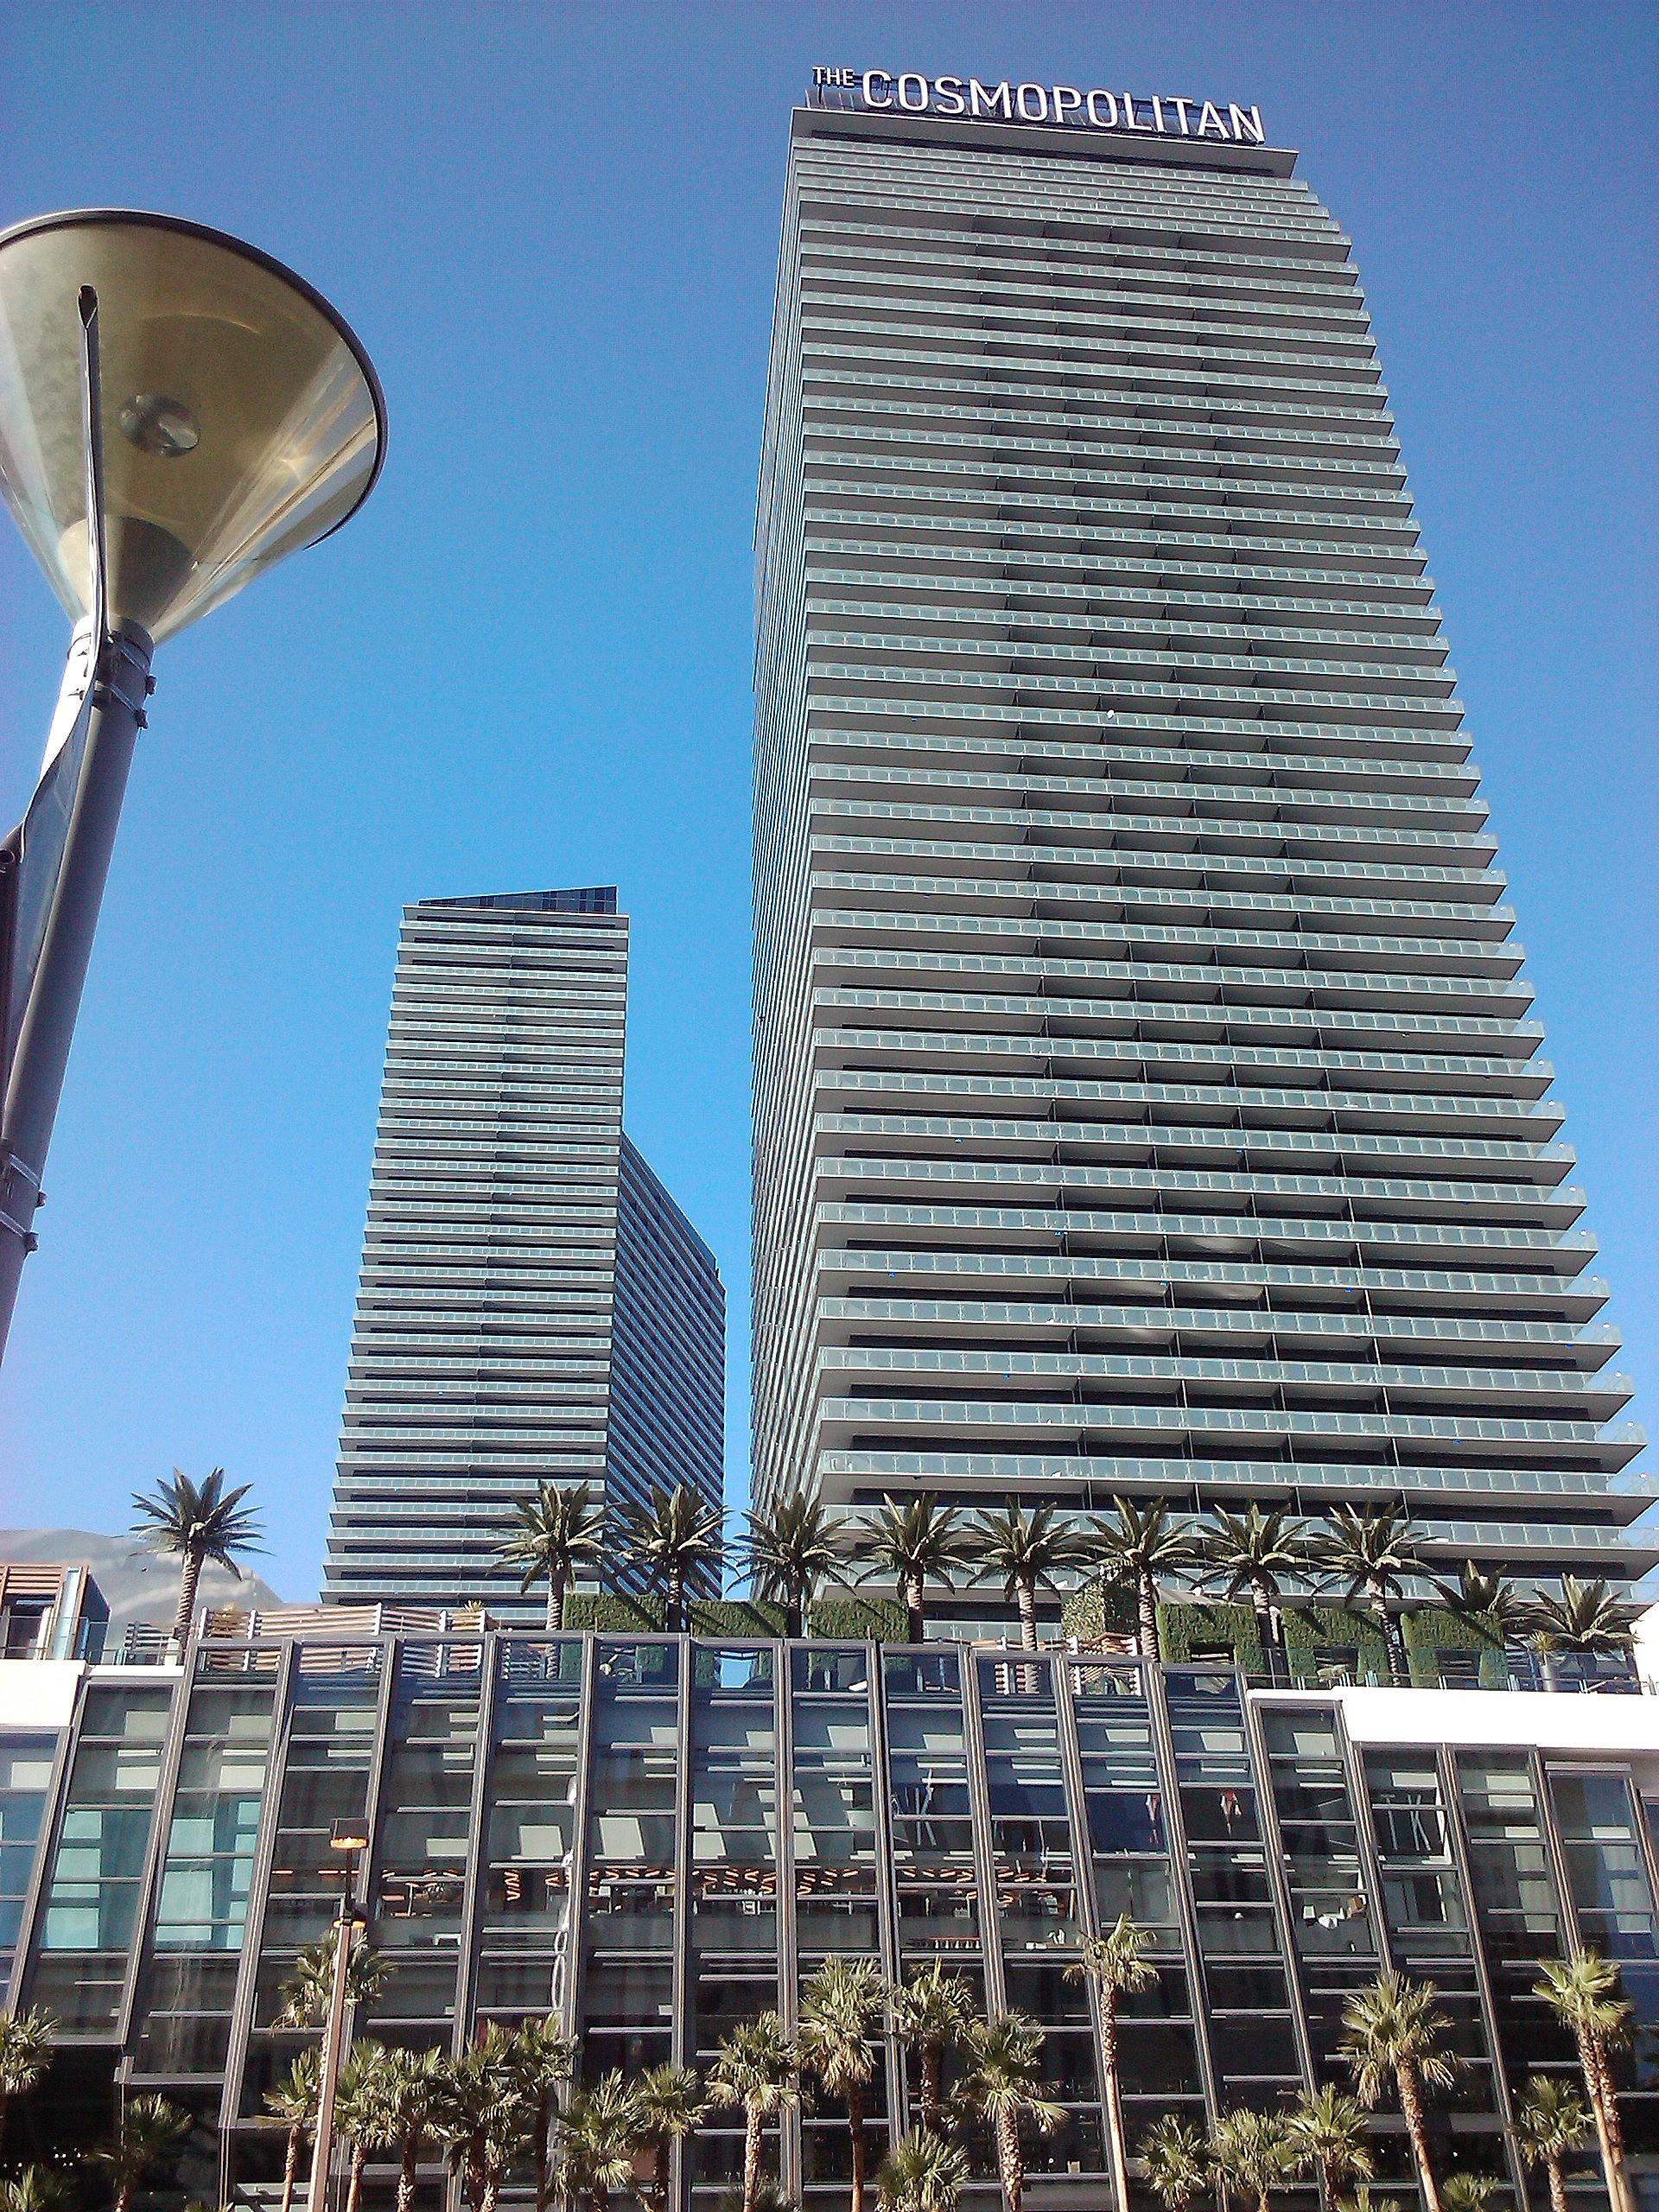 Las Vegas Gambling Casino Overview The Cosmopolitan